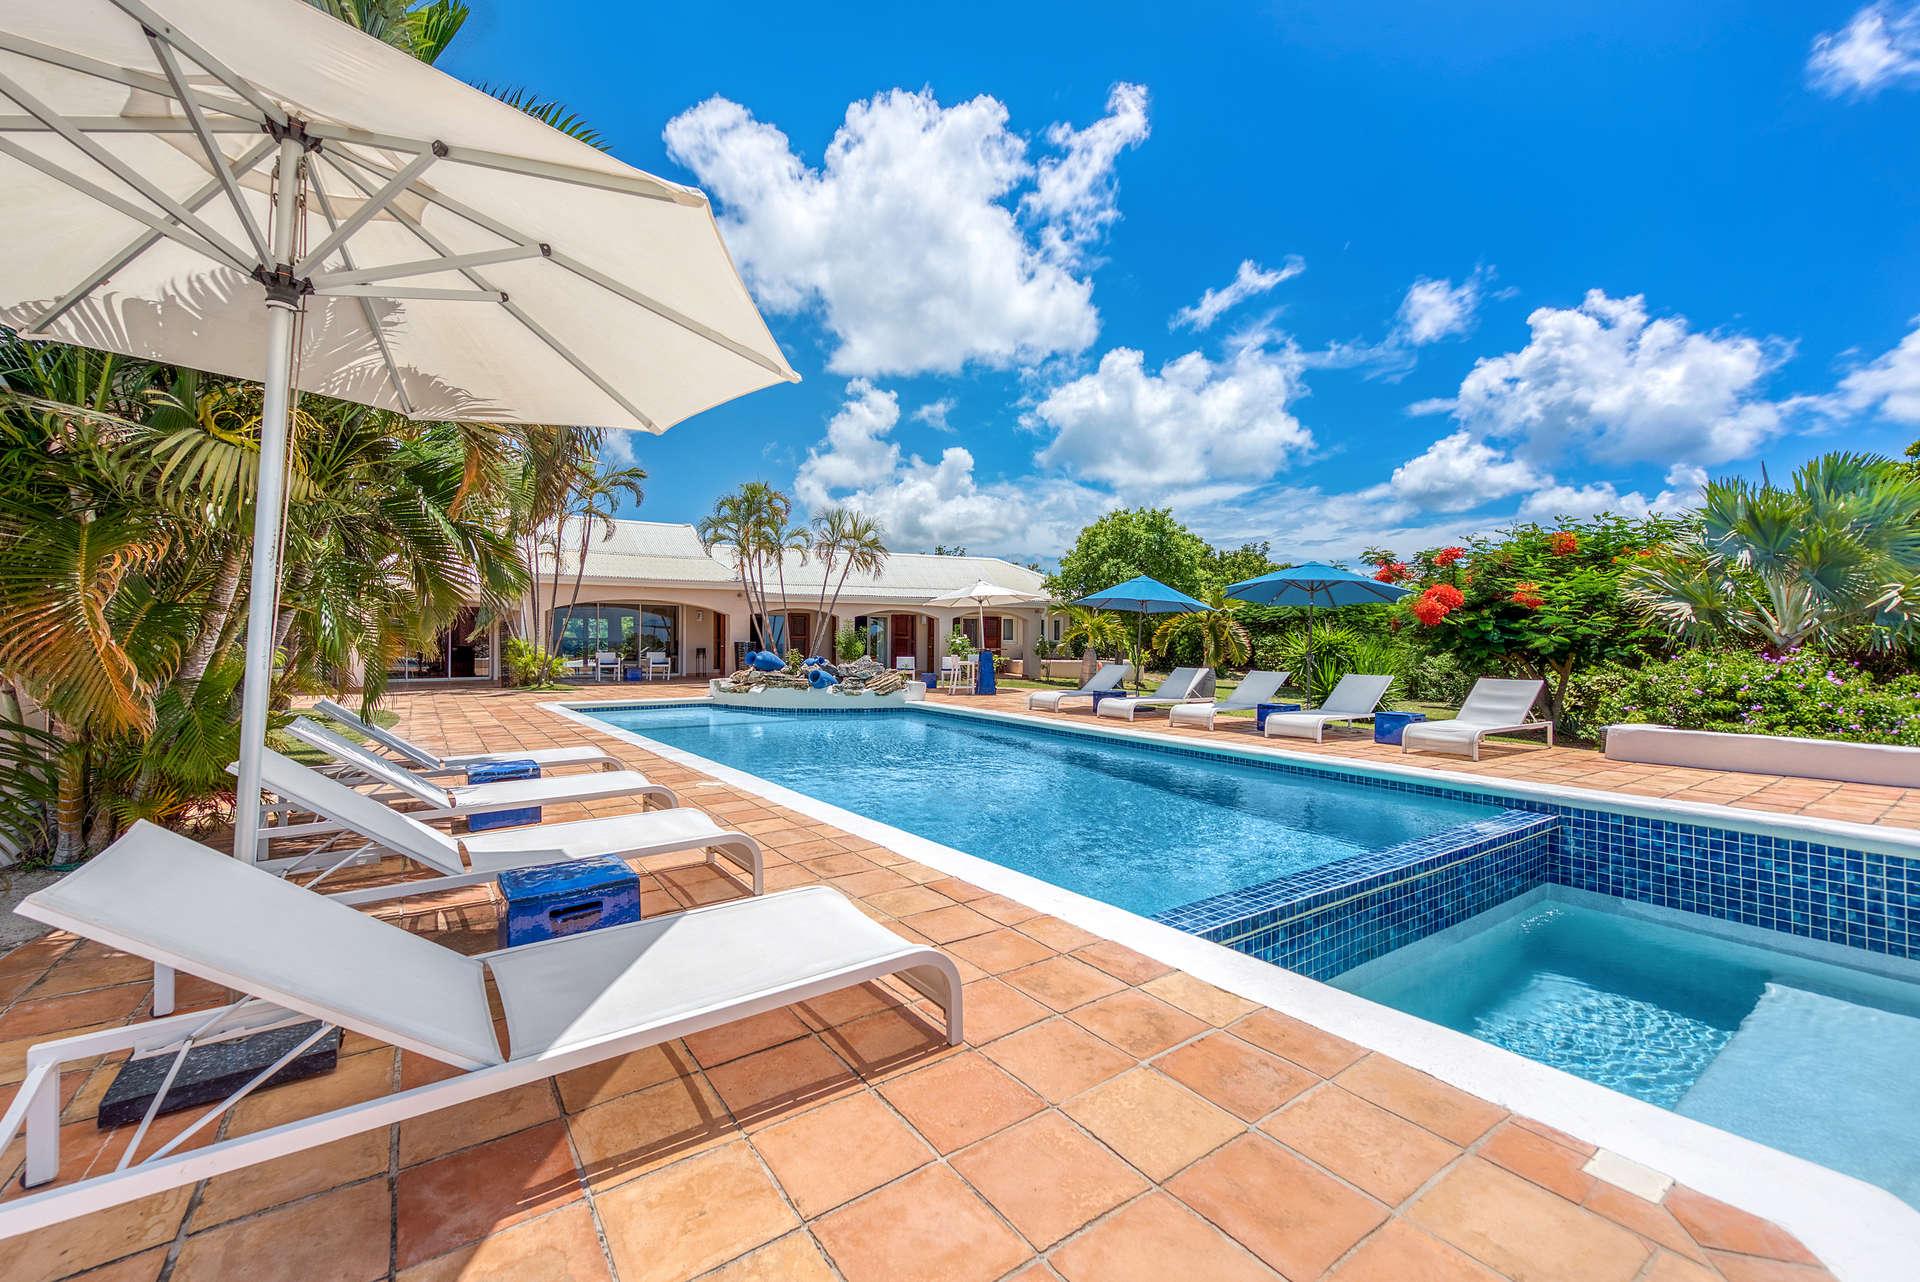 Luxury villa rentals caribbean - St martin - Saint martin french - Les terres basses - La Pergola - Image 1/33